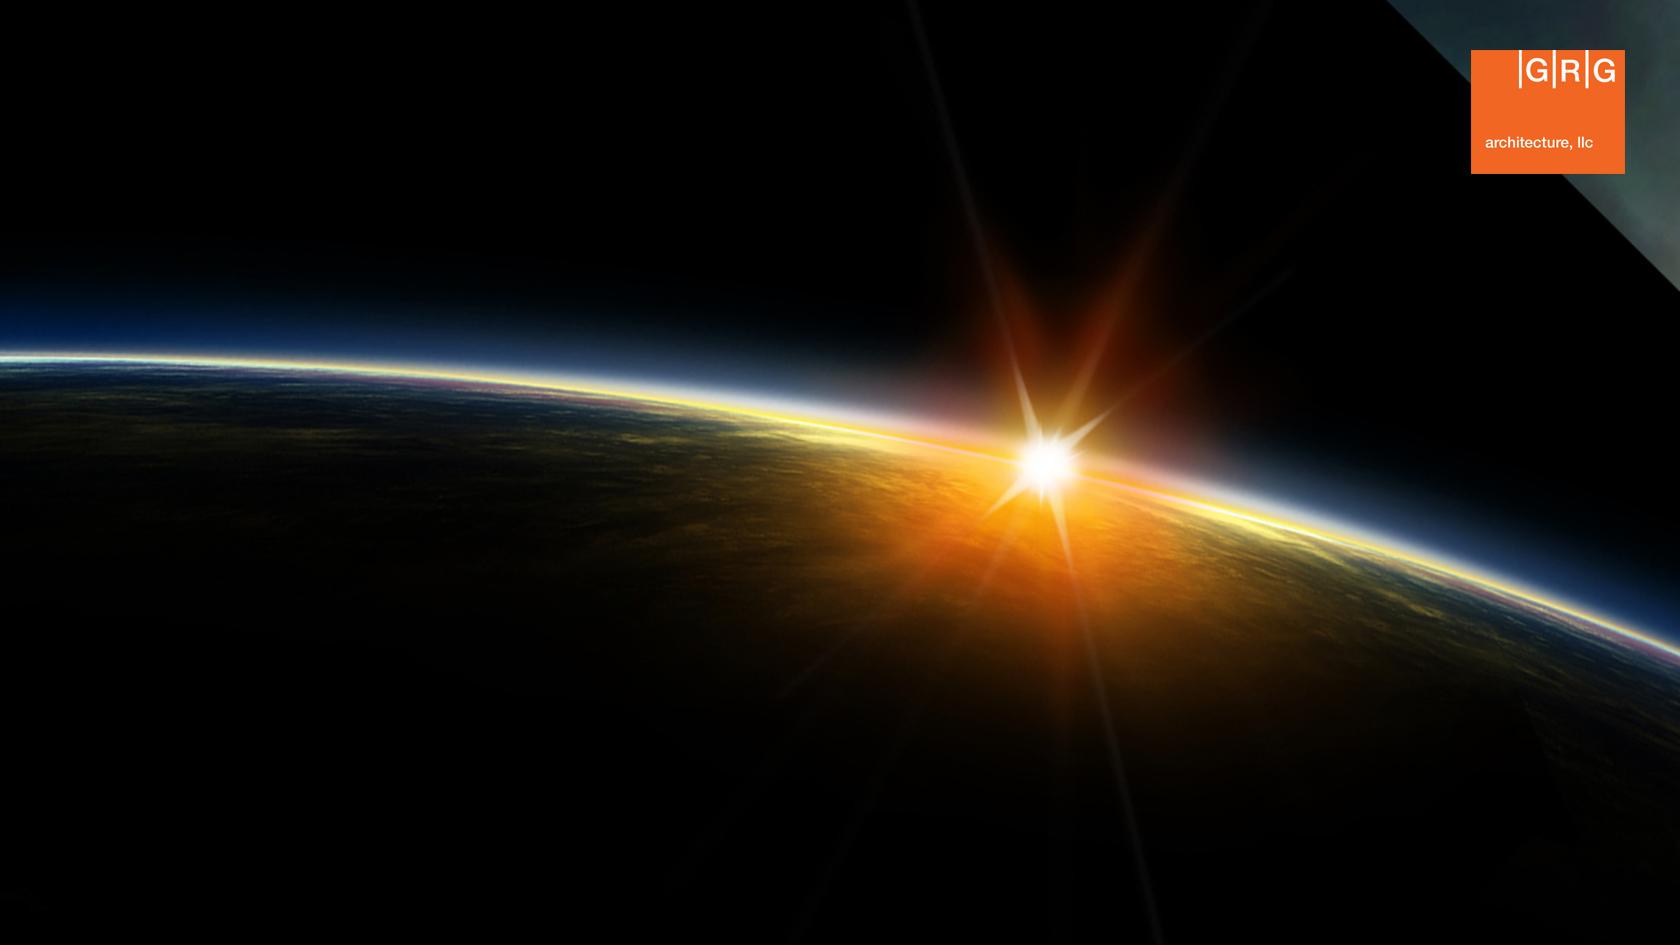 grg-orbit.jpg